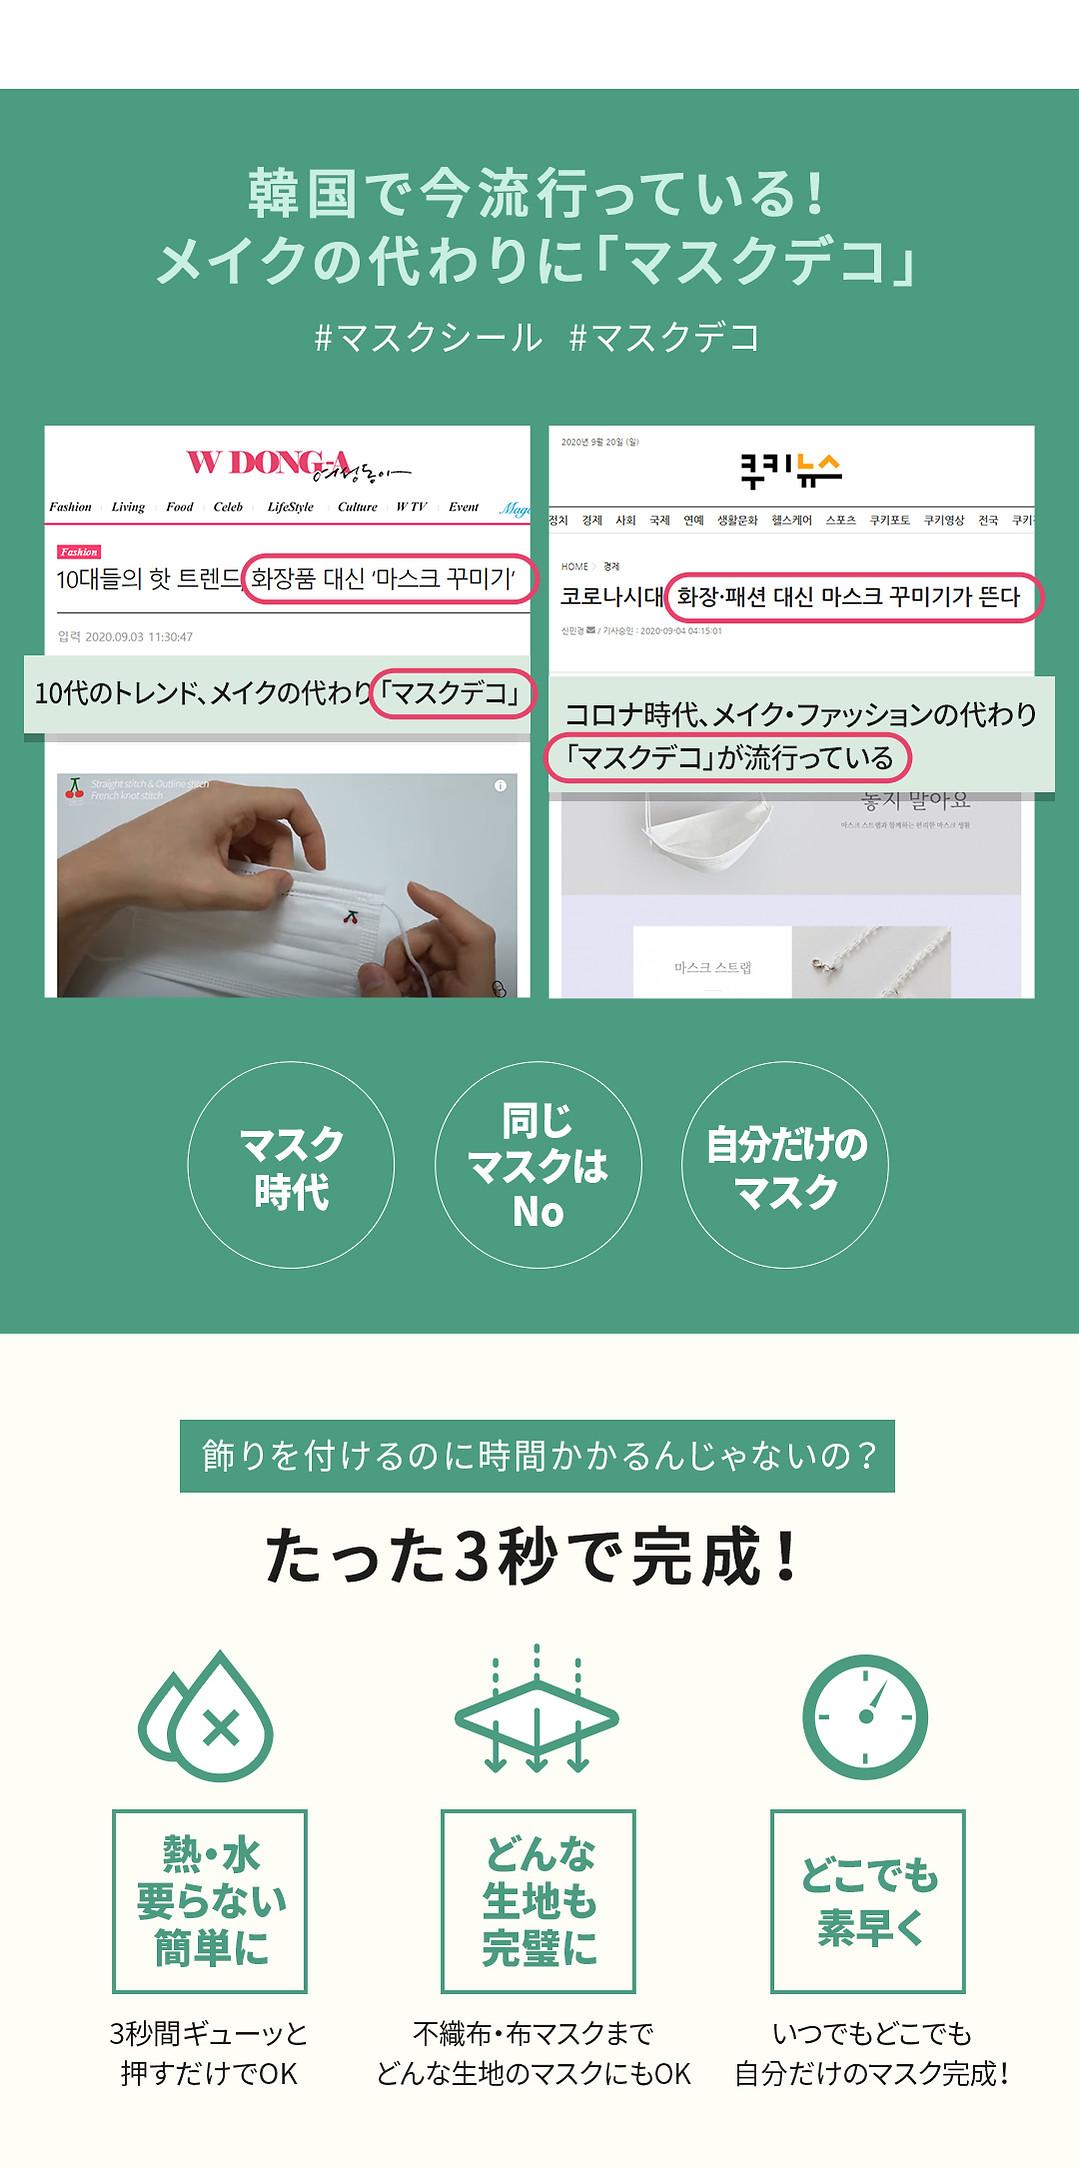 MO_5_06.jpg